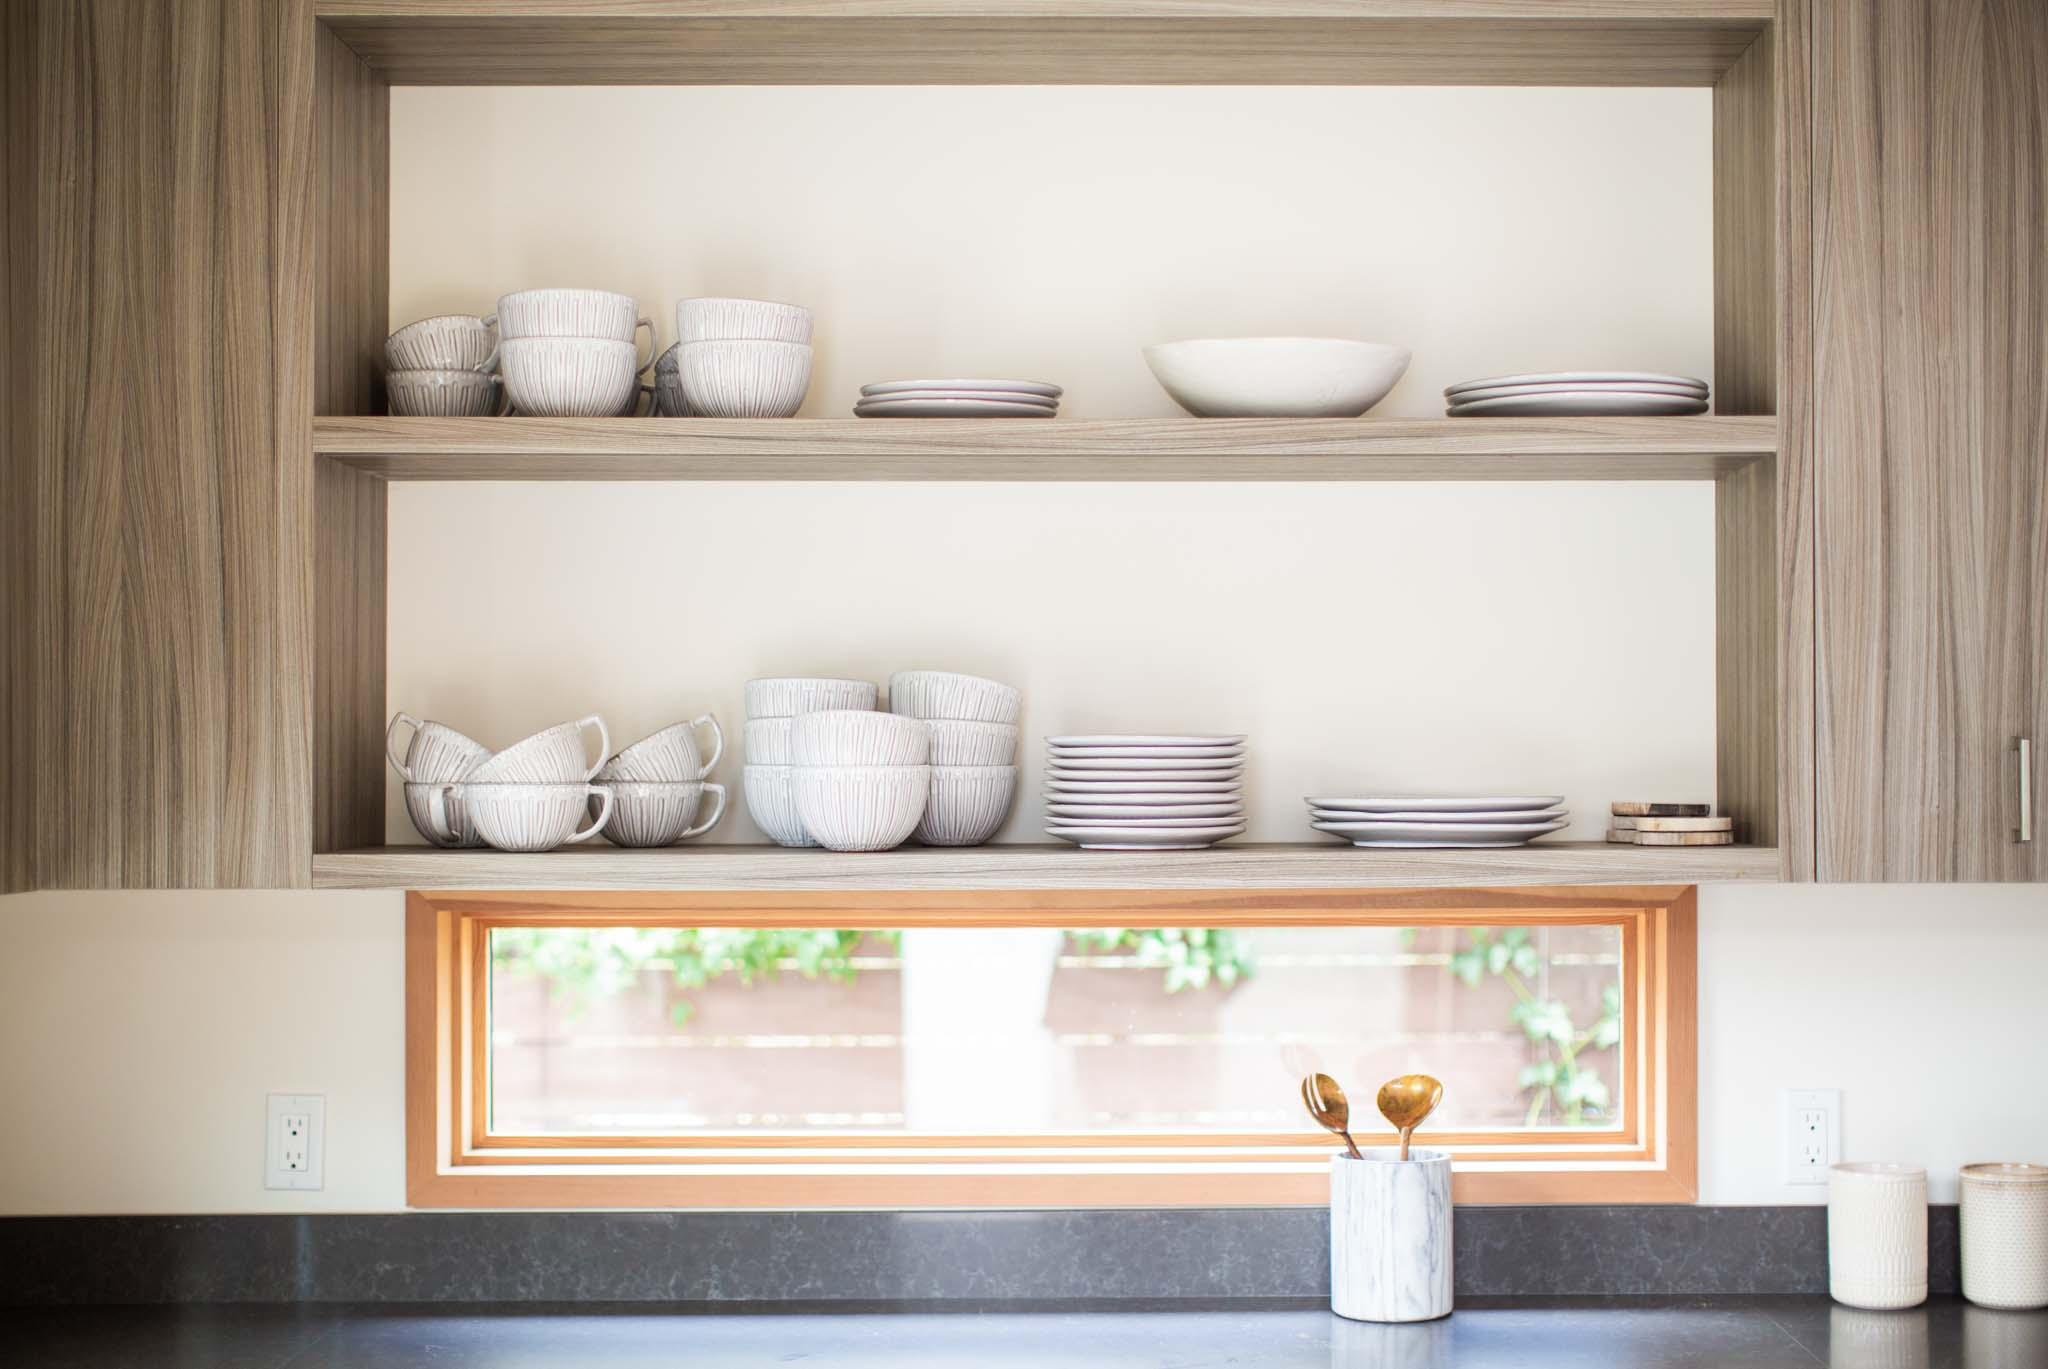 Jodi G Designs | Santa Barbara Interior Design Lanscape -8.jpg